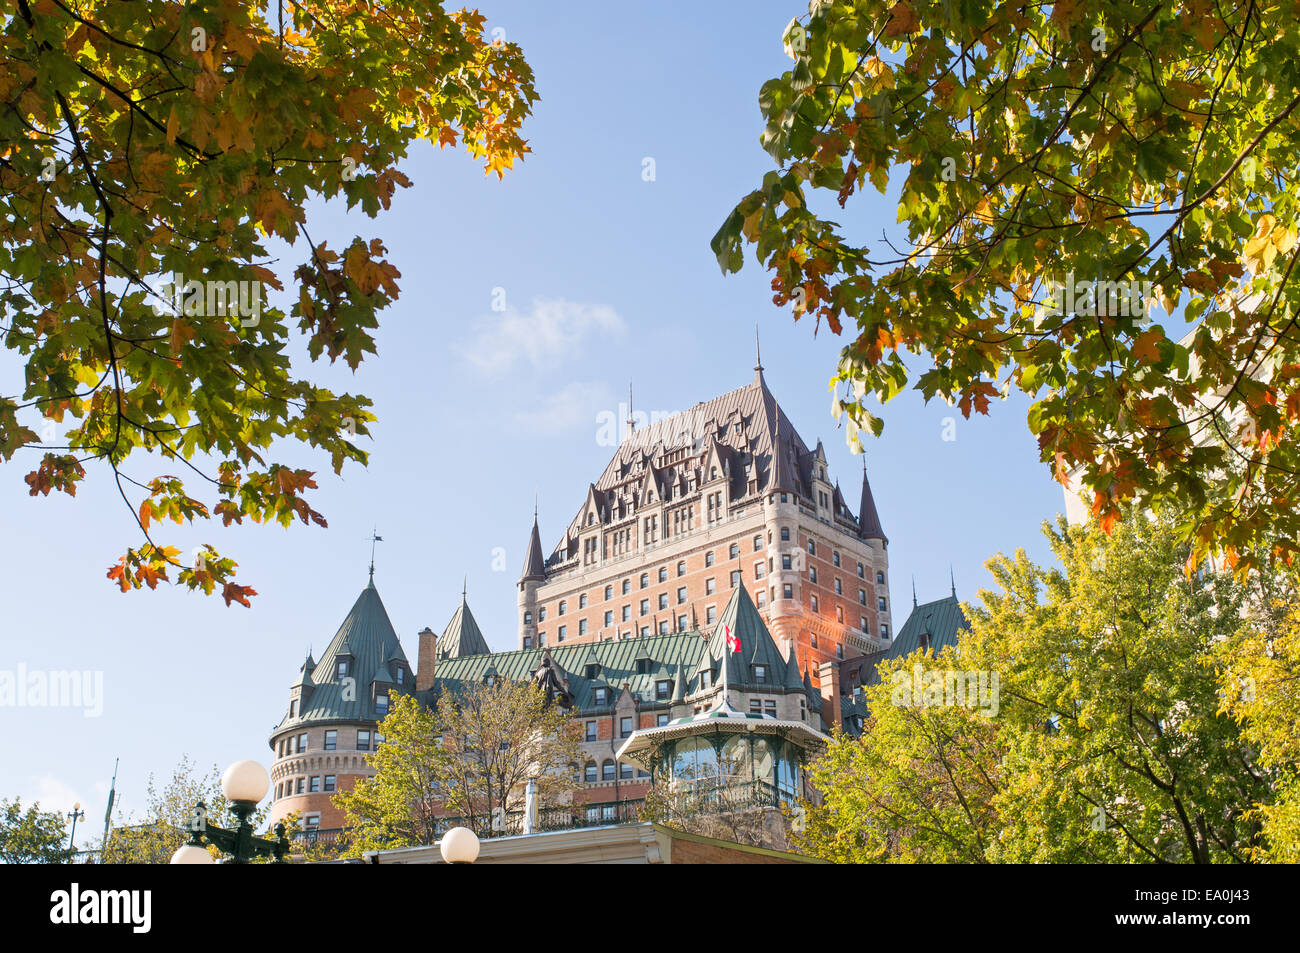 Château Frontenac  in autumn Quebec City, Quebec, Canada - Stock Image